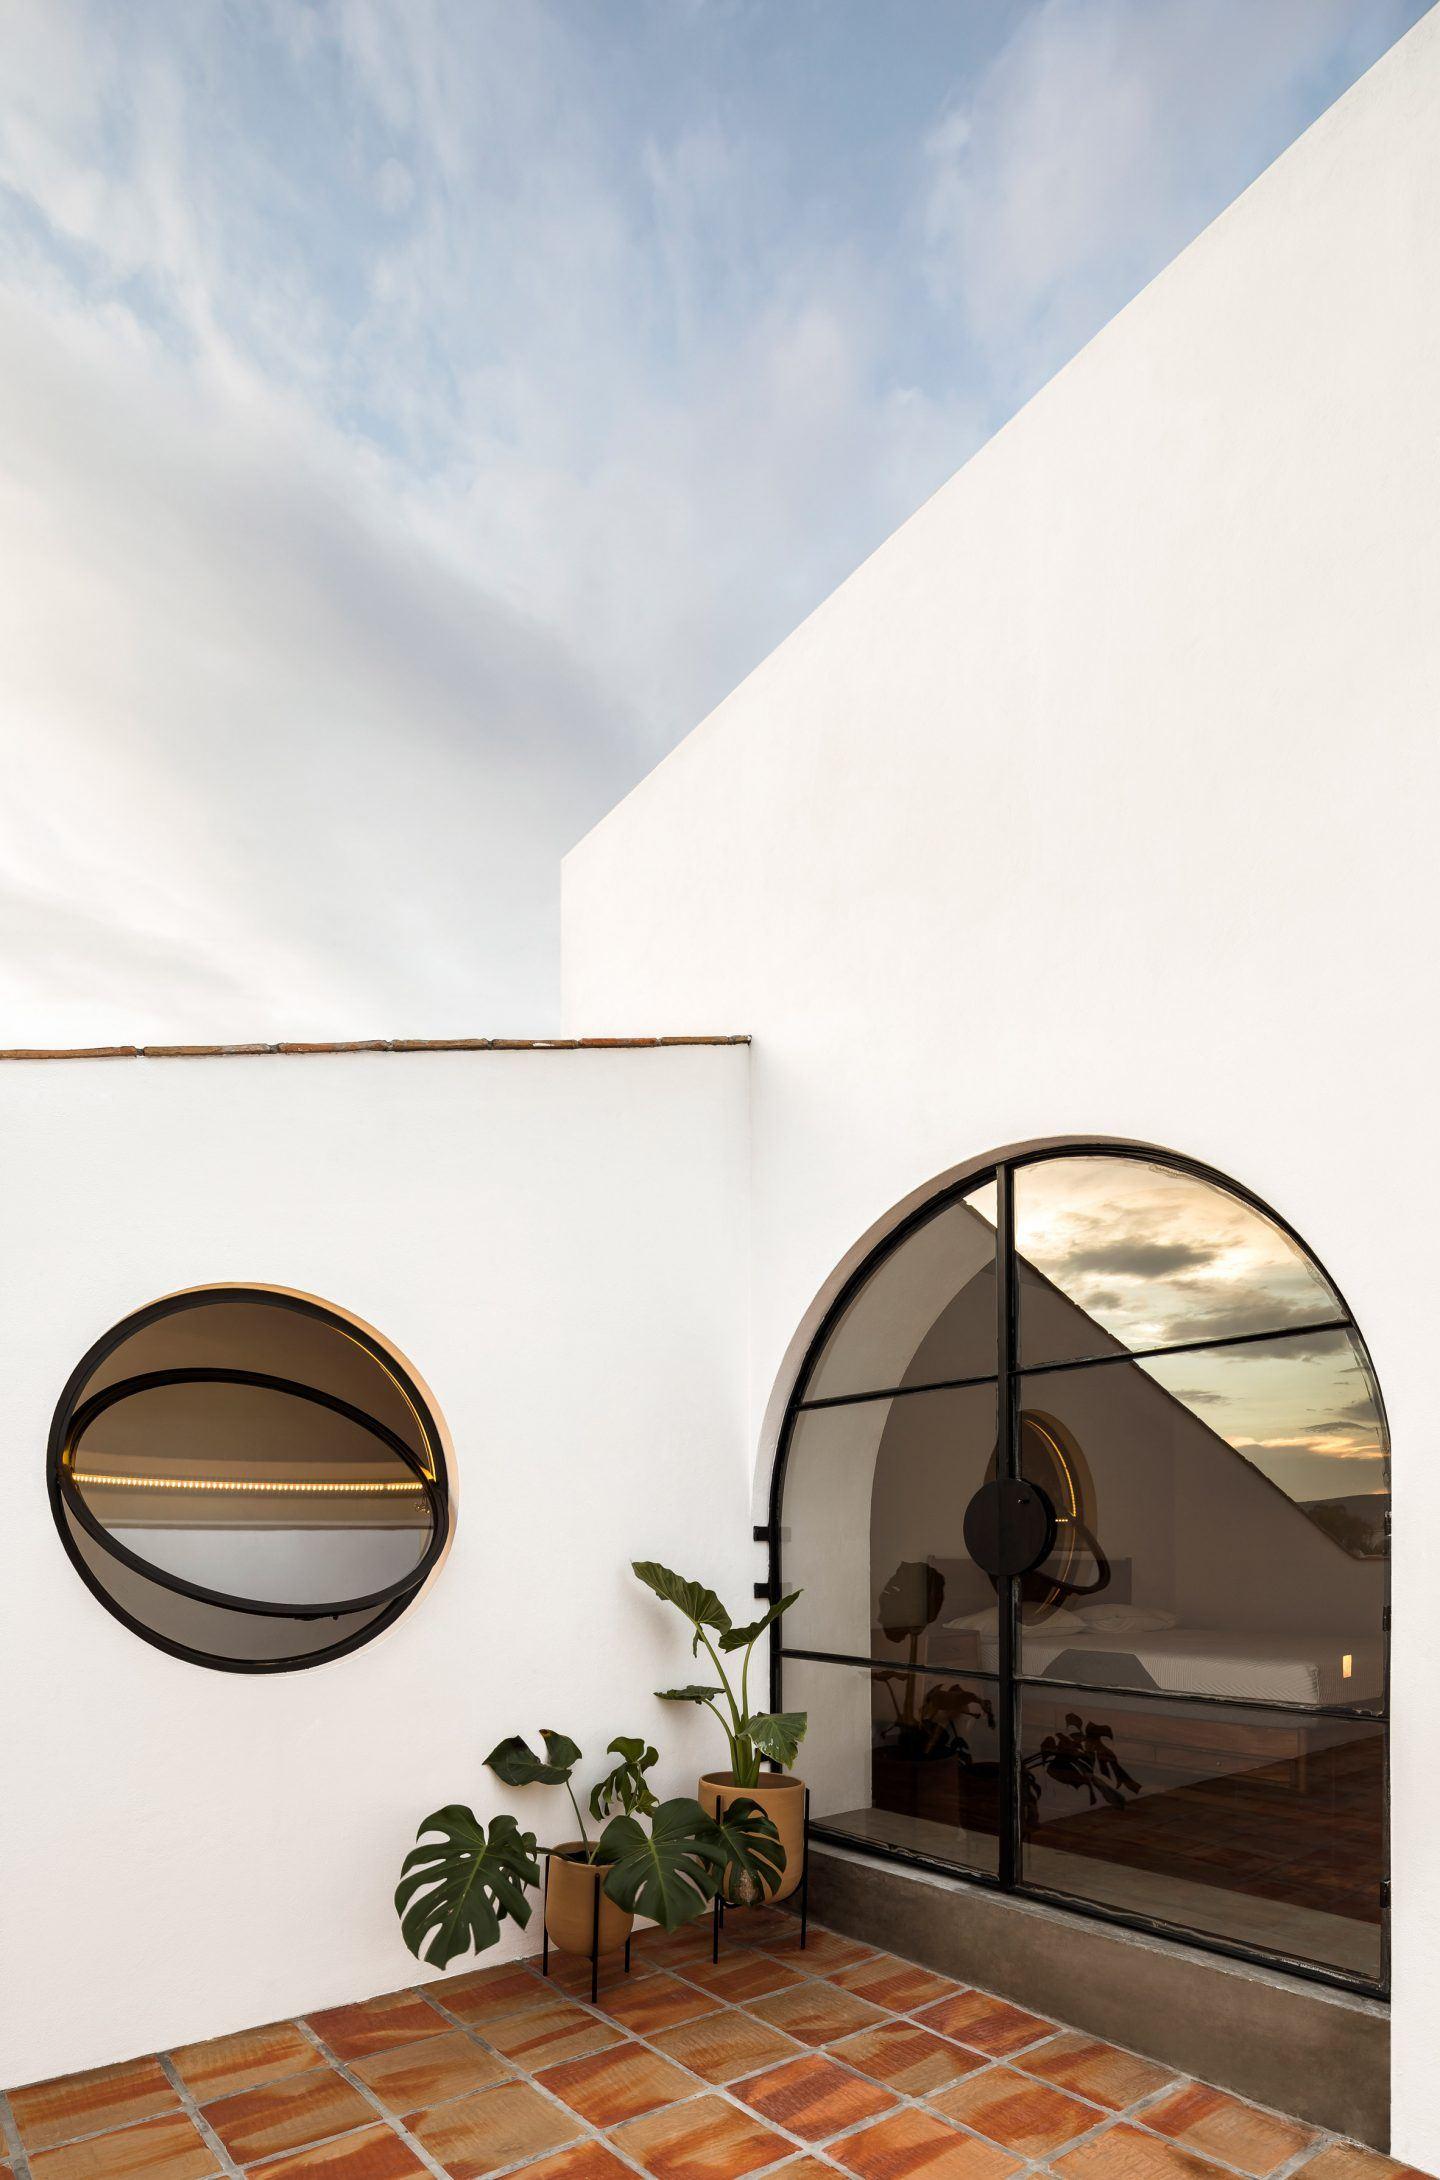 IGNANT-Architecture-Delfino-Lozano-Cesar-Bejar-Casa-690-05